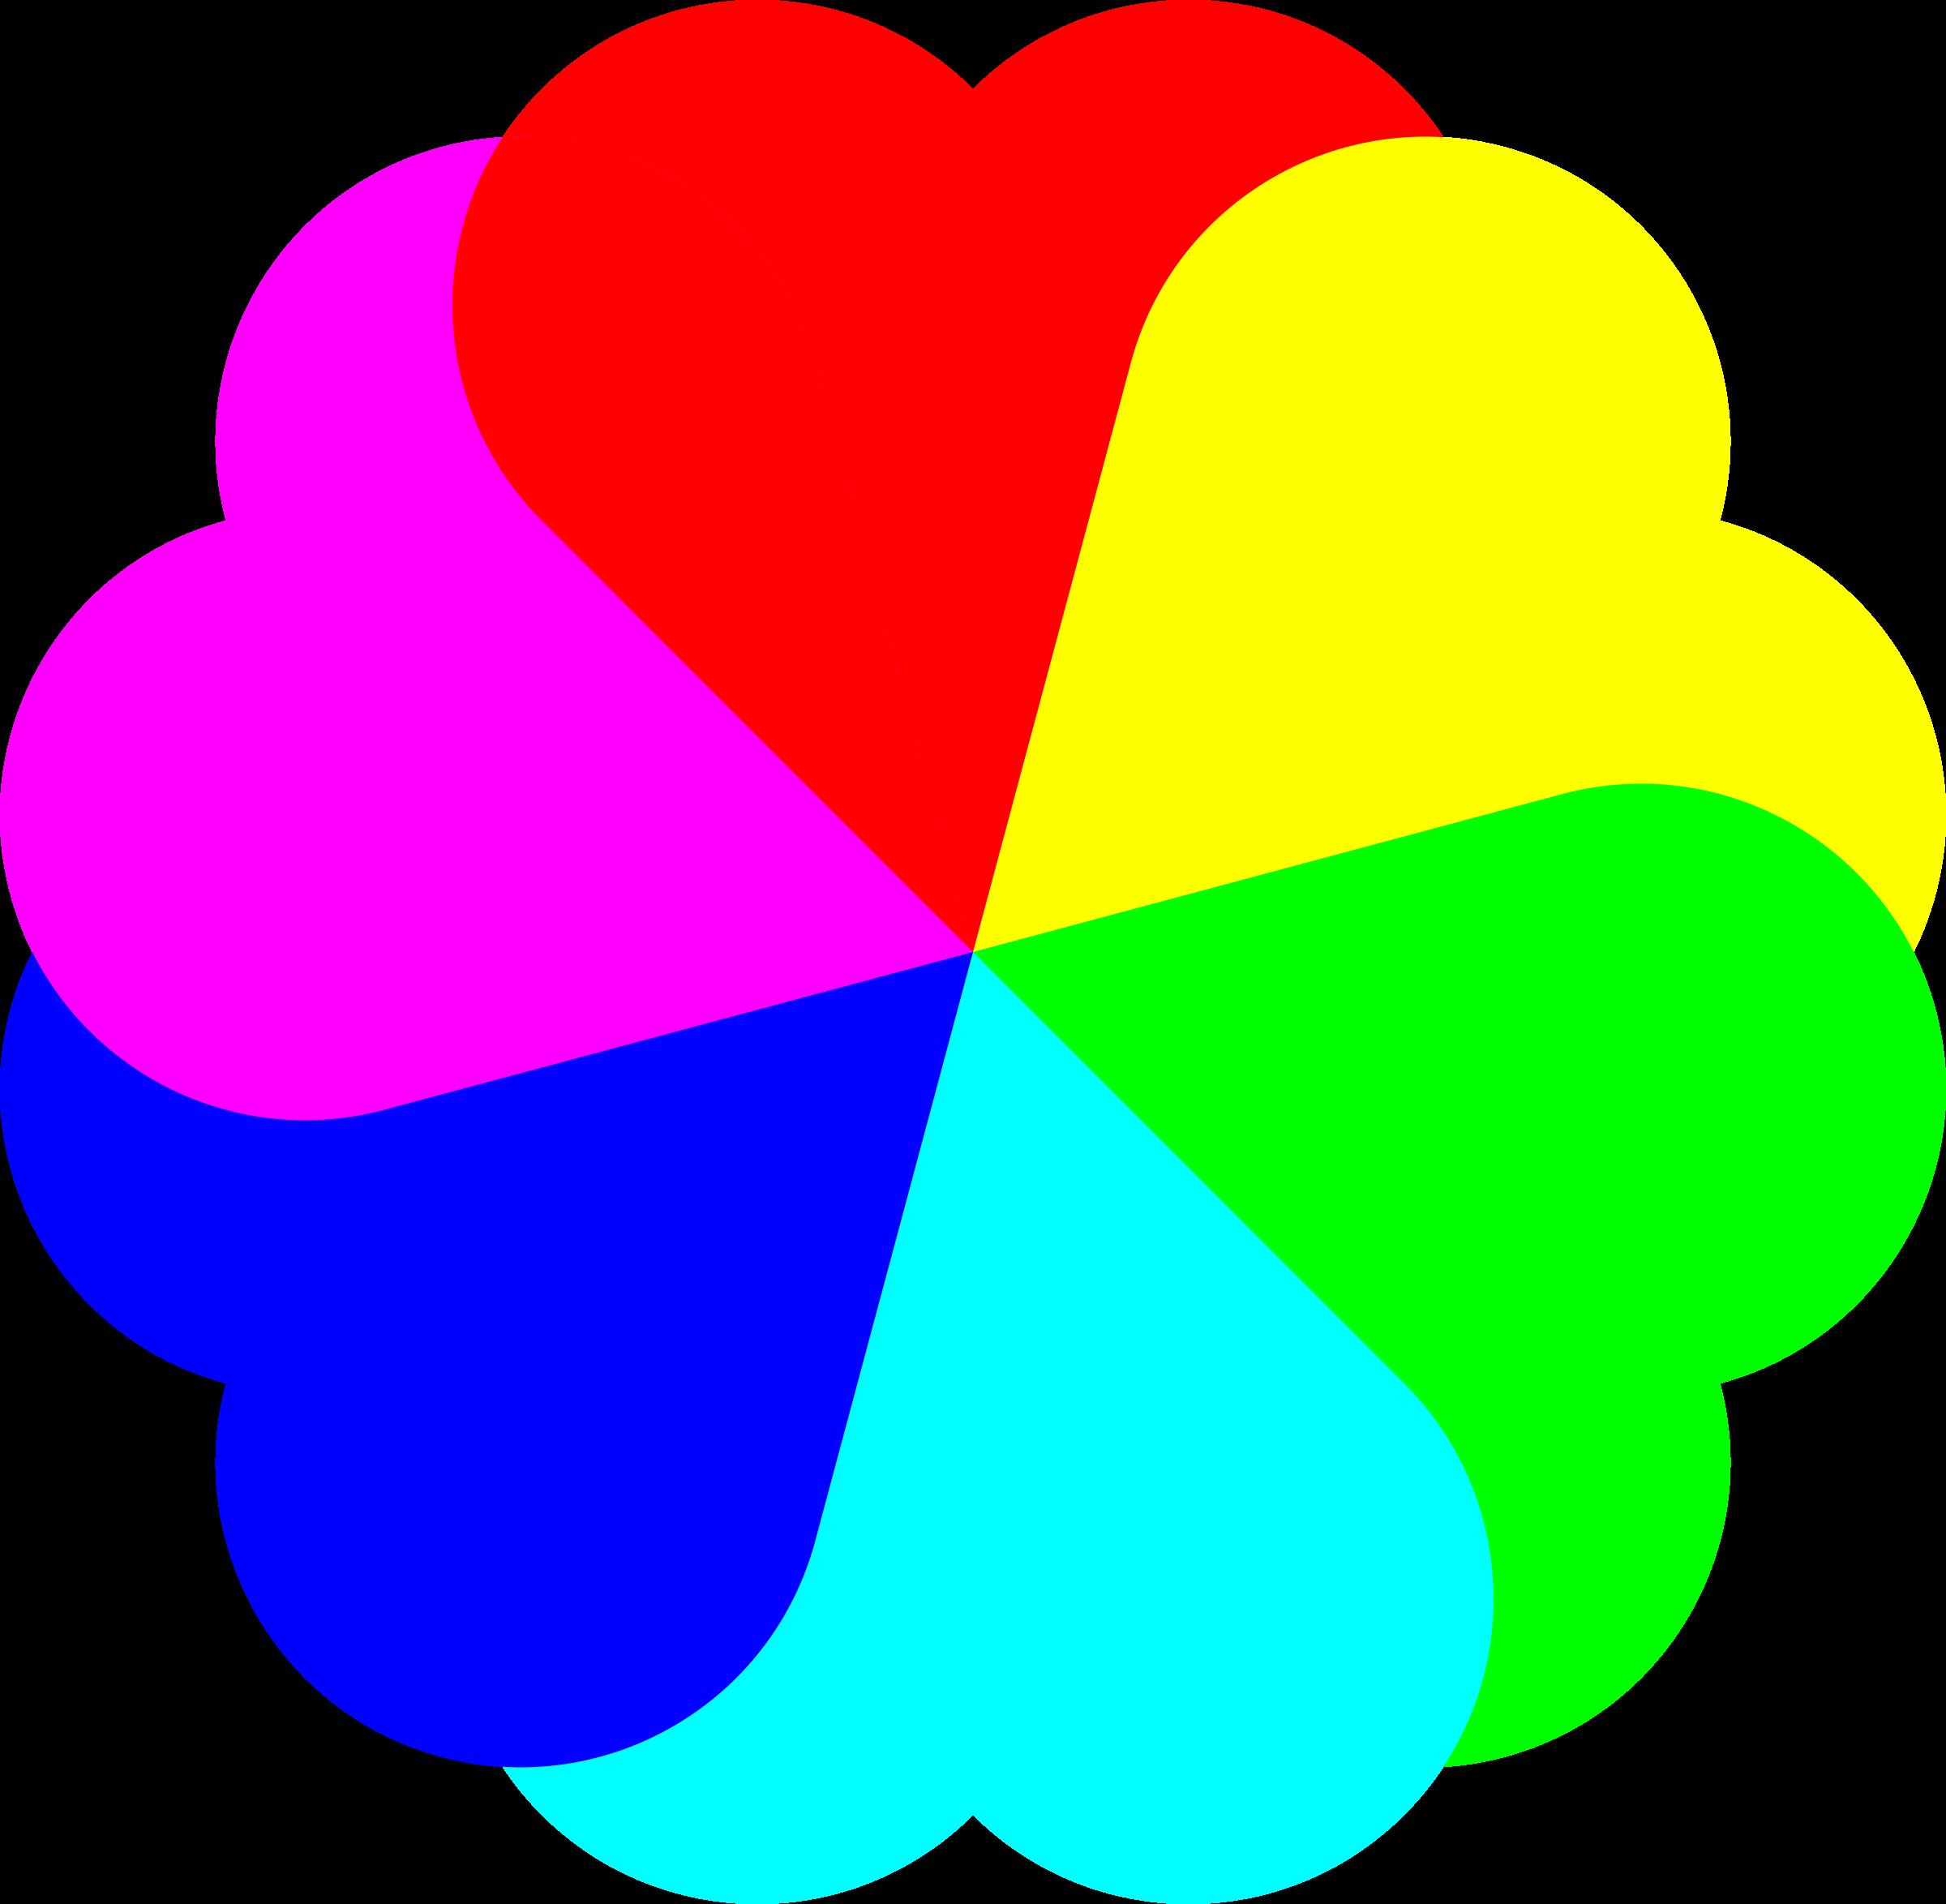 Colors clipart eye. Flowerheart spectrum big image